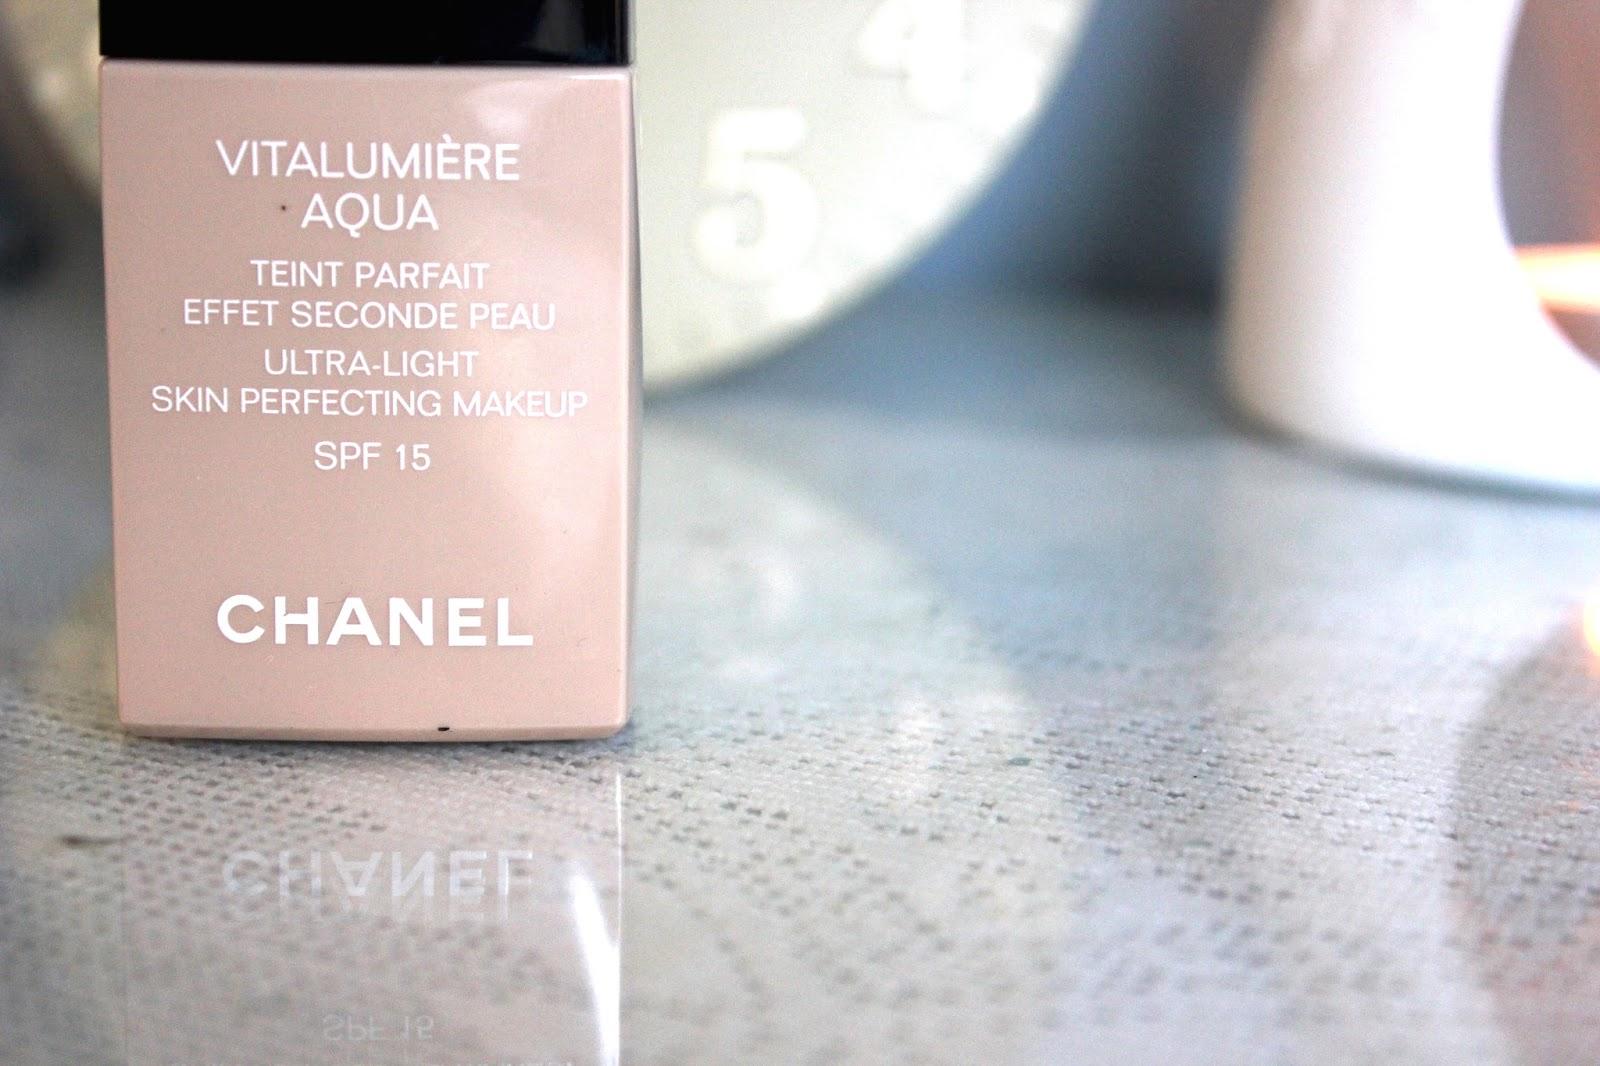 Chanel Vitalumiere Aqua Review Becka Shepherd Vitalumire Ultra Light Skin Perfecting Makeup Spf 15 Img 2547